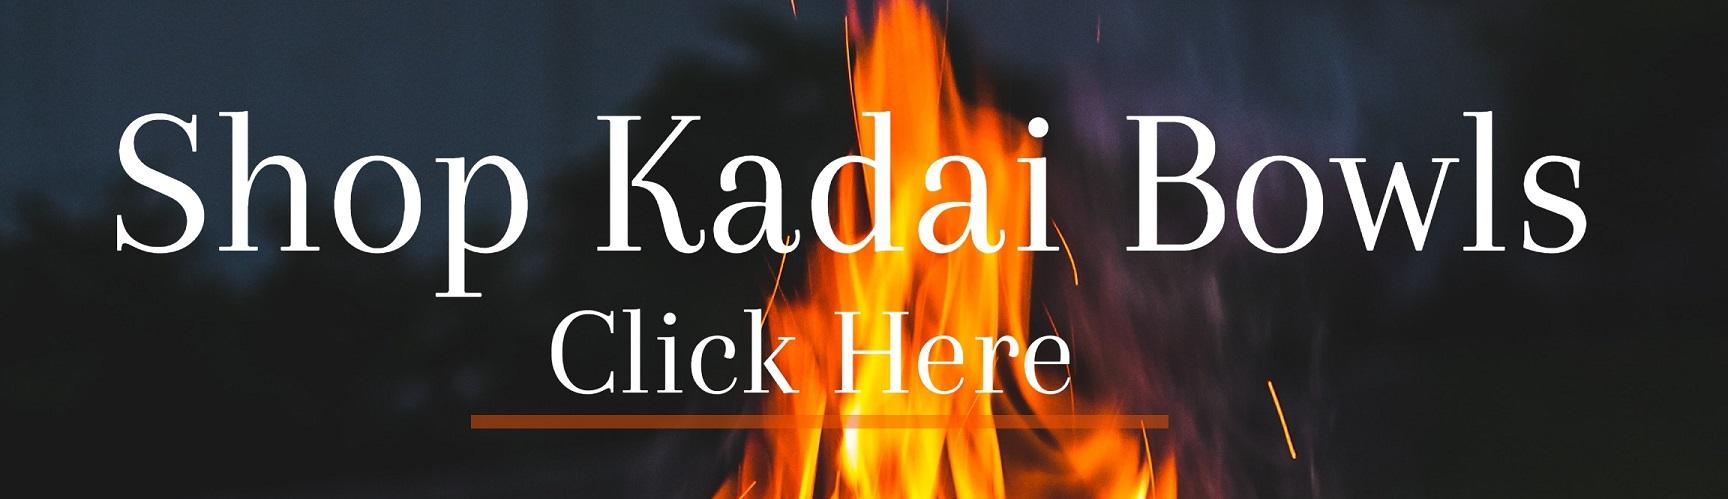 Our Range of Kadai Bowls